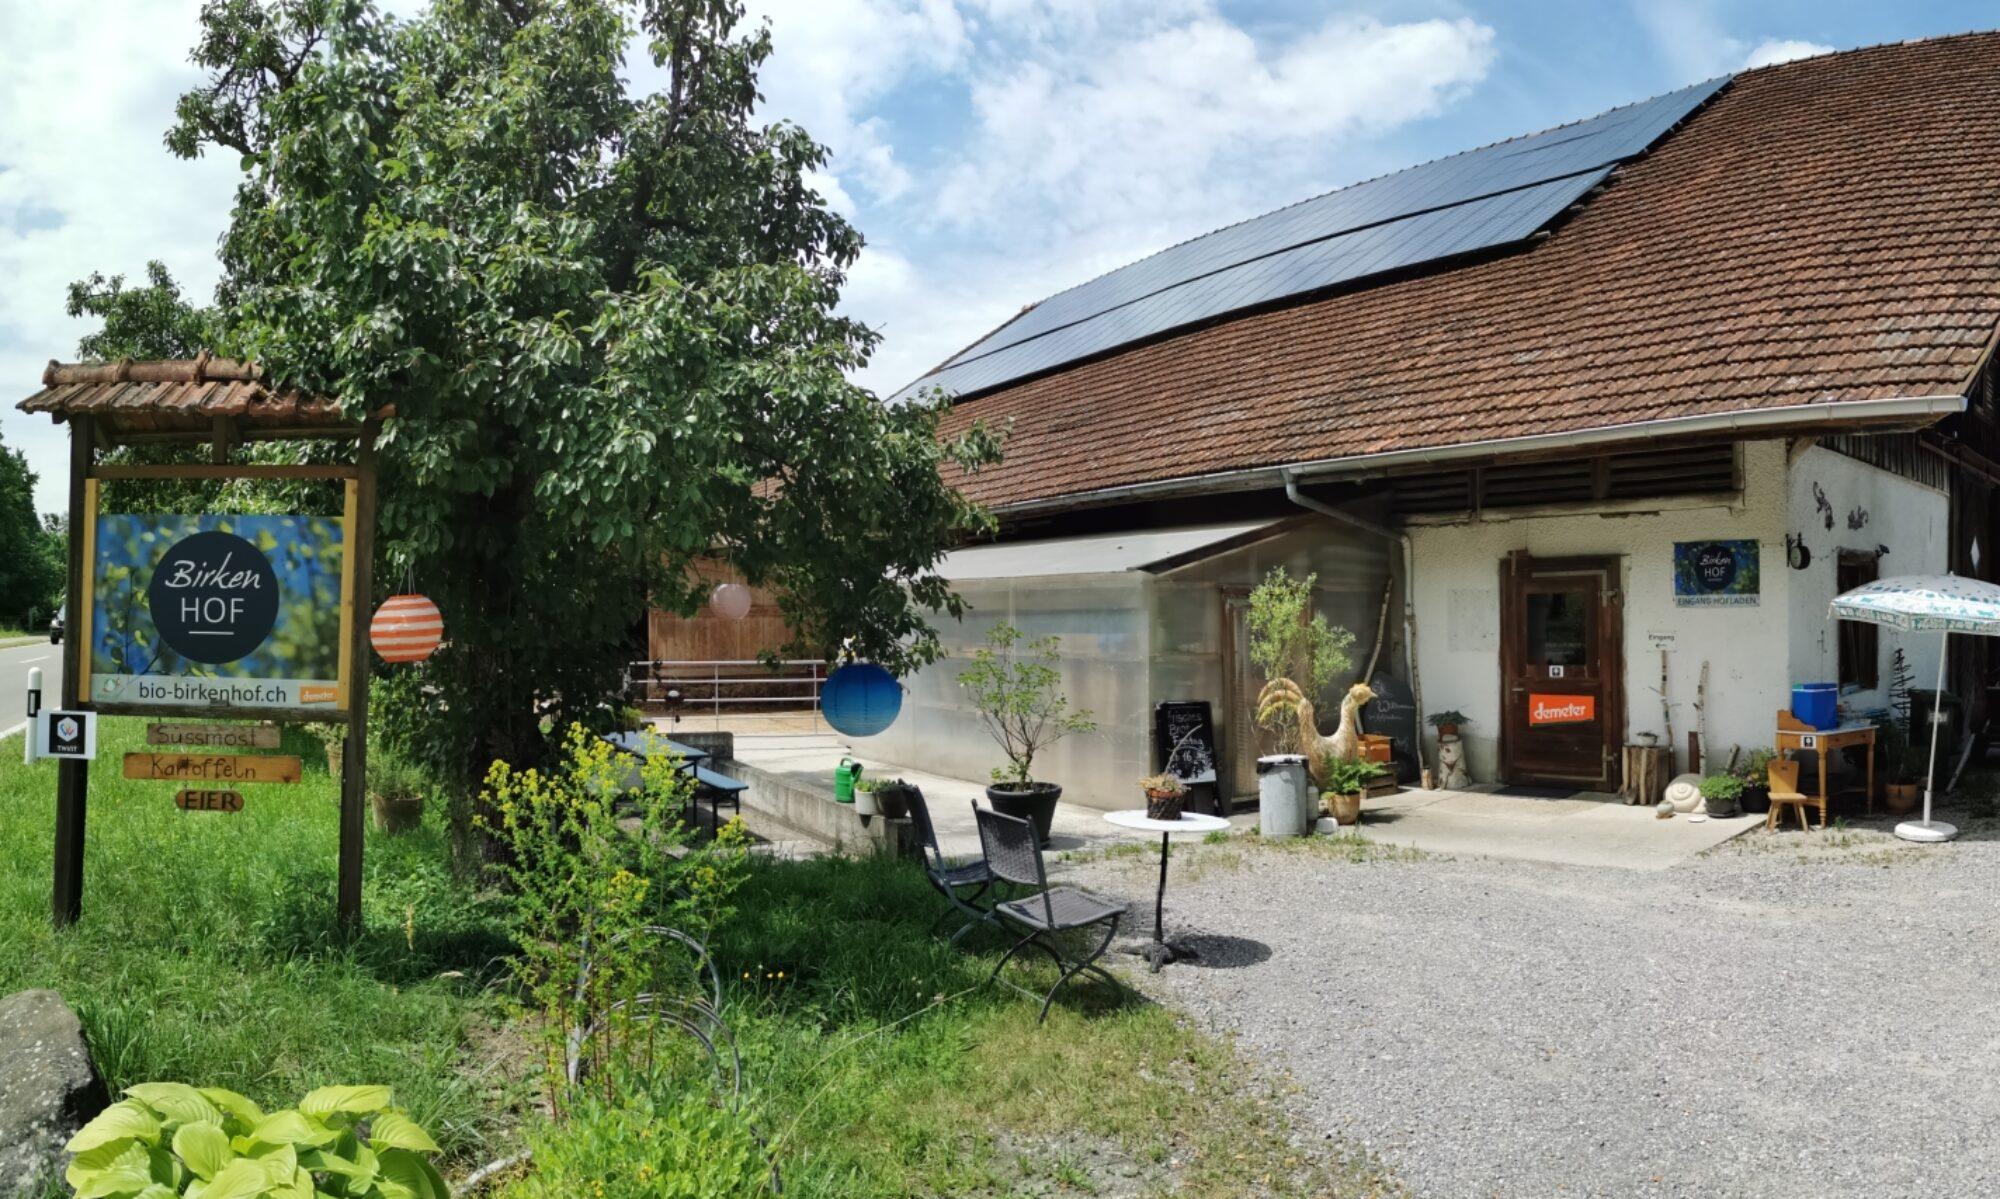 bio-birkenhof.ch